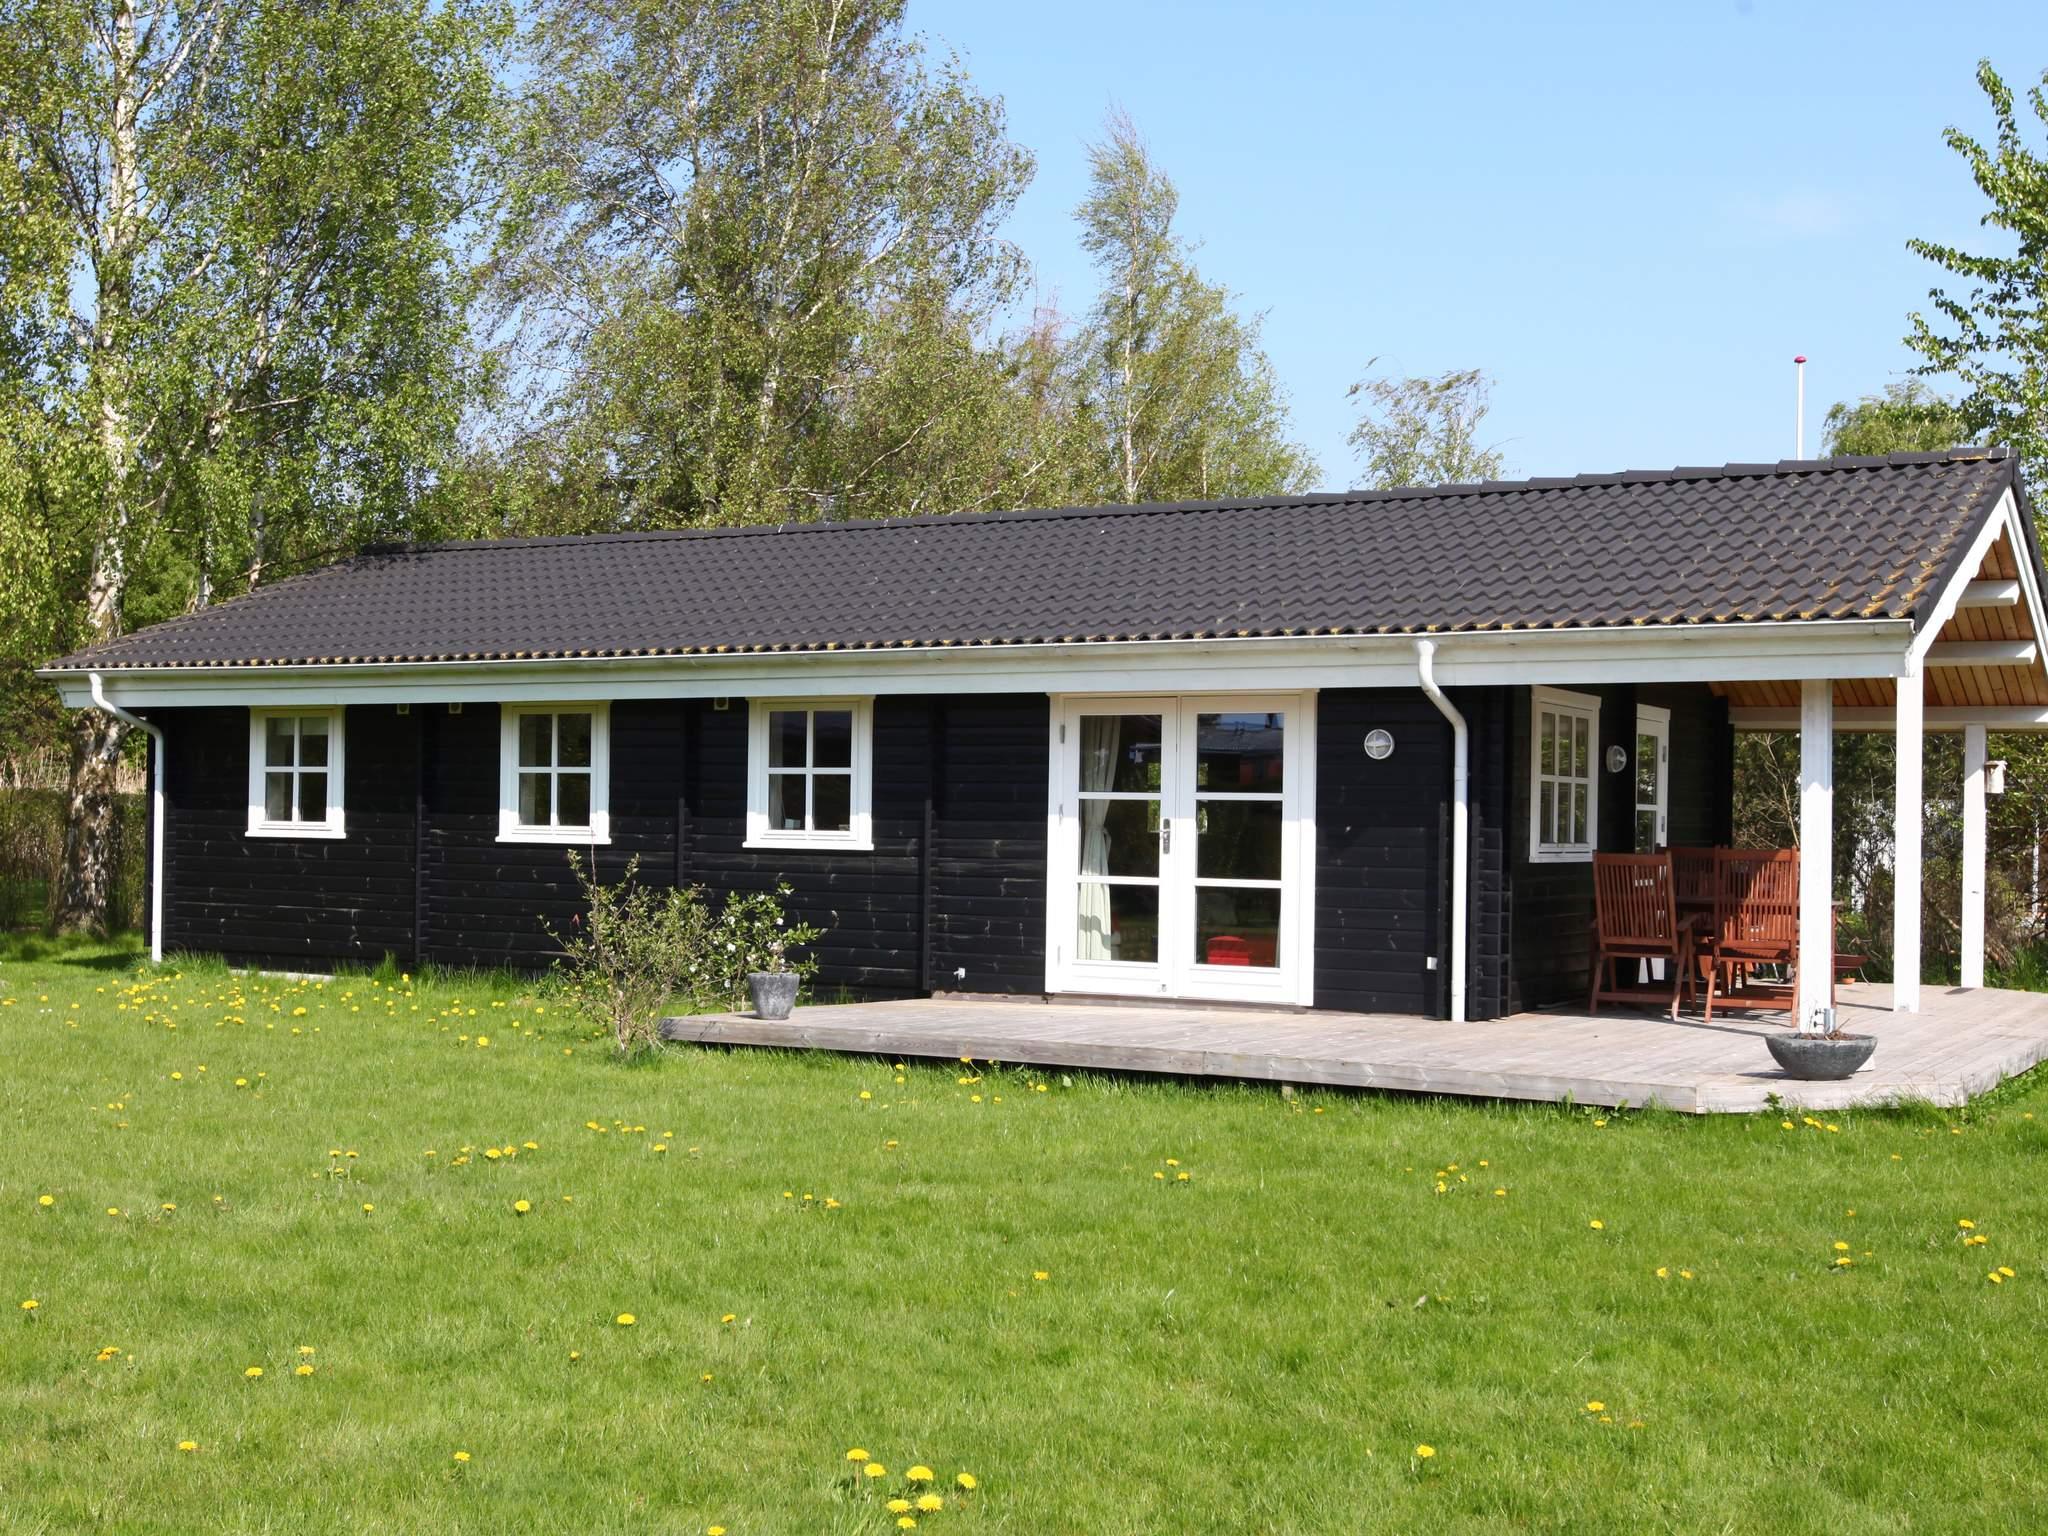 Ferienhaus Hyllingeriis (561298), Skibby, , Nordseeland, Dänemark, Bild 15